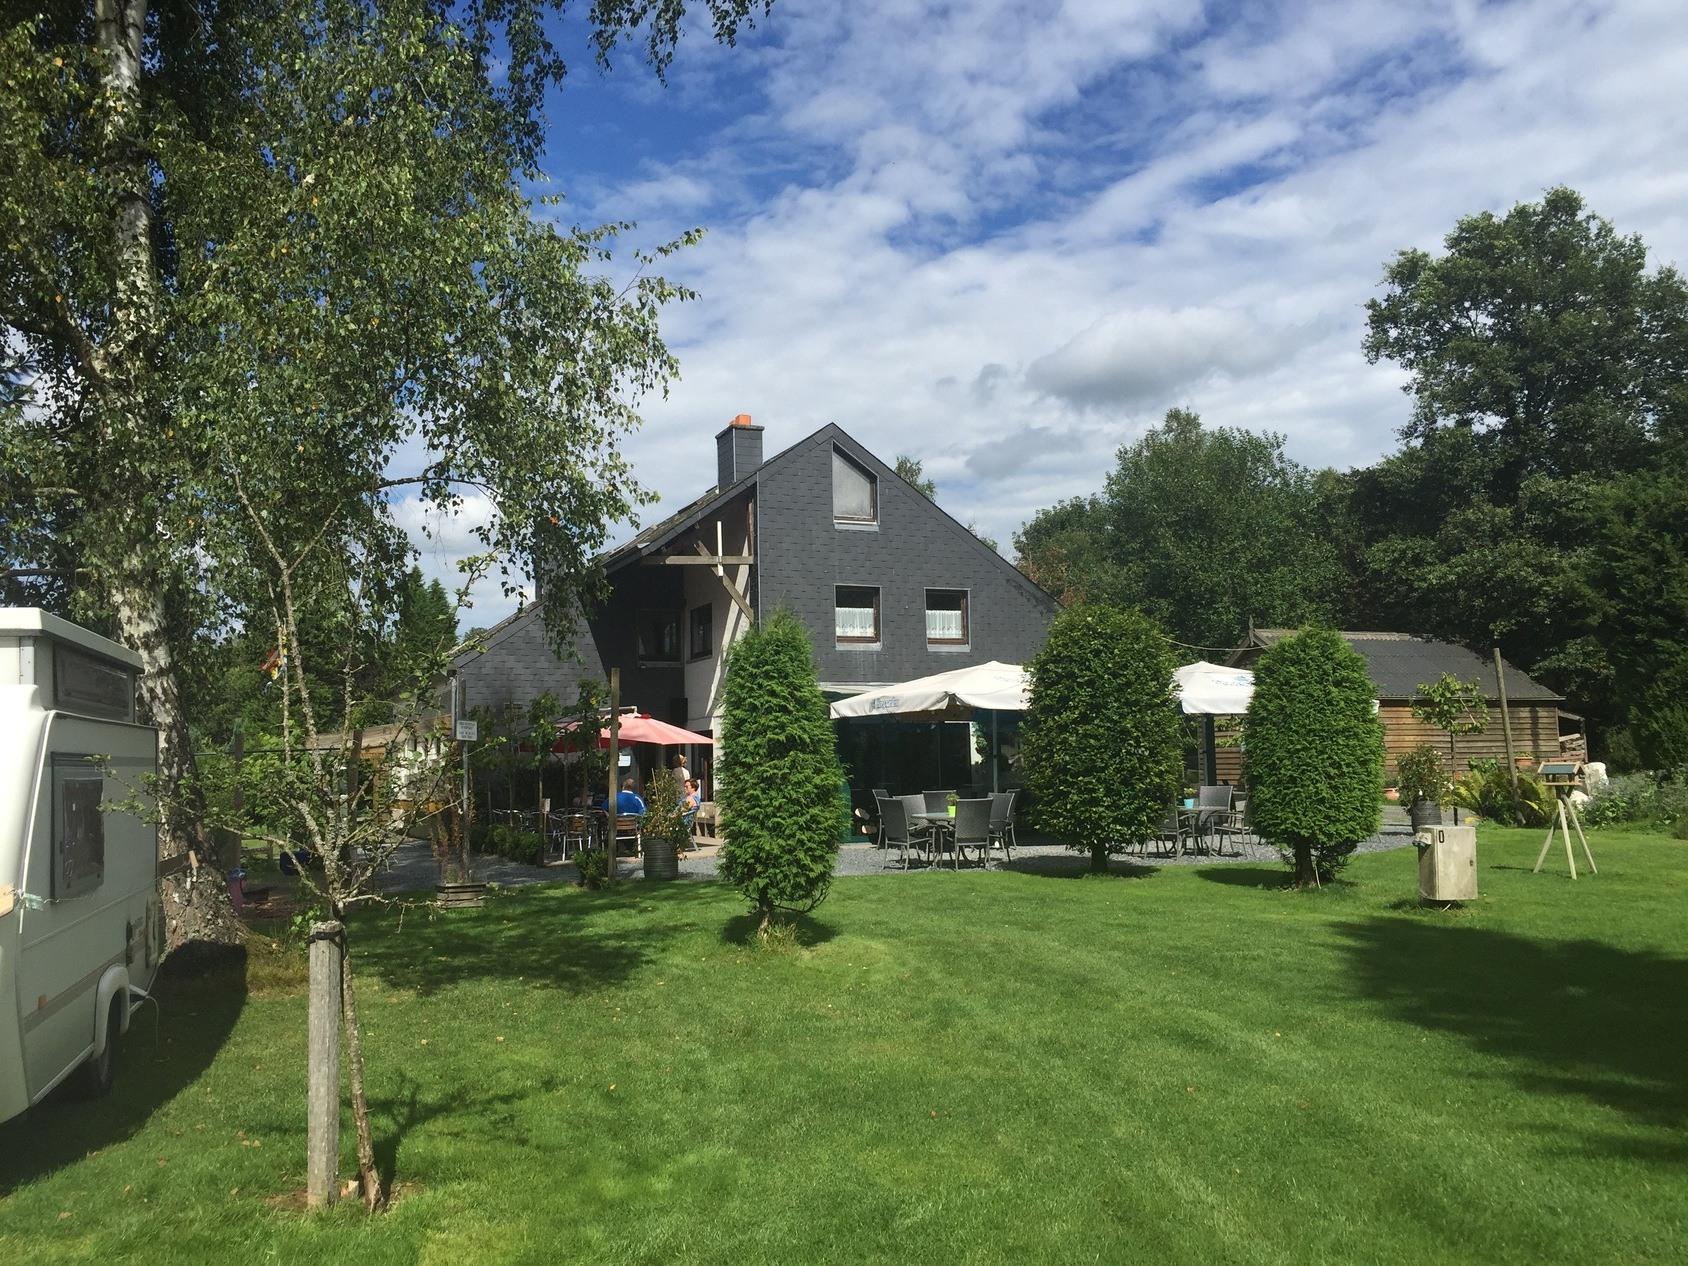 Belgie-Neufchateau-Vodatent-ExtraLarge Campings België